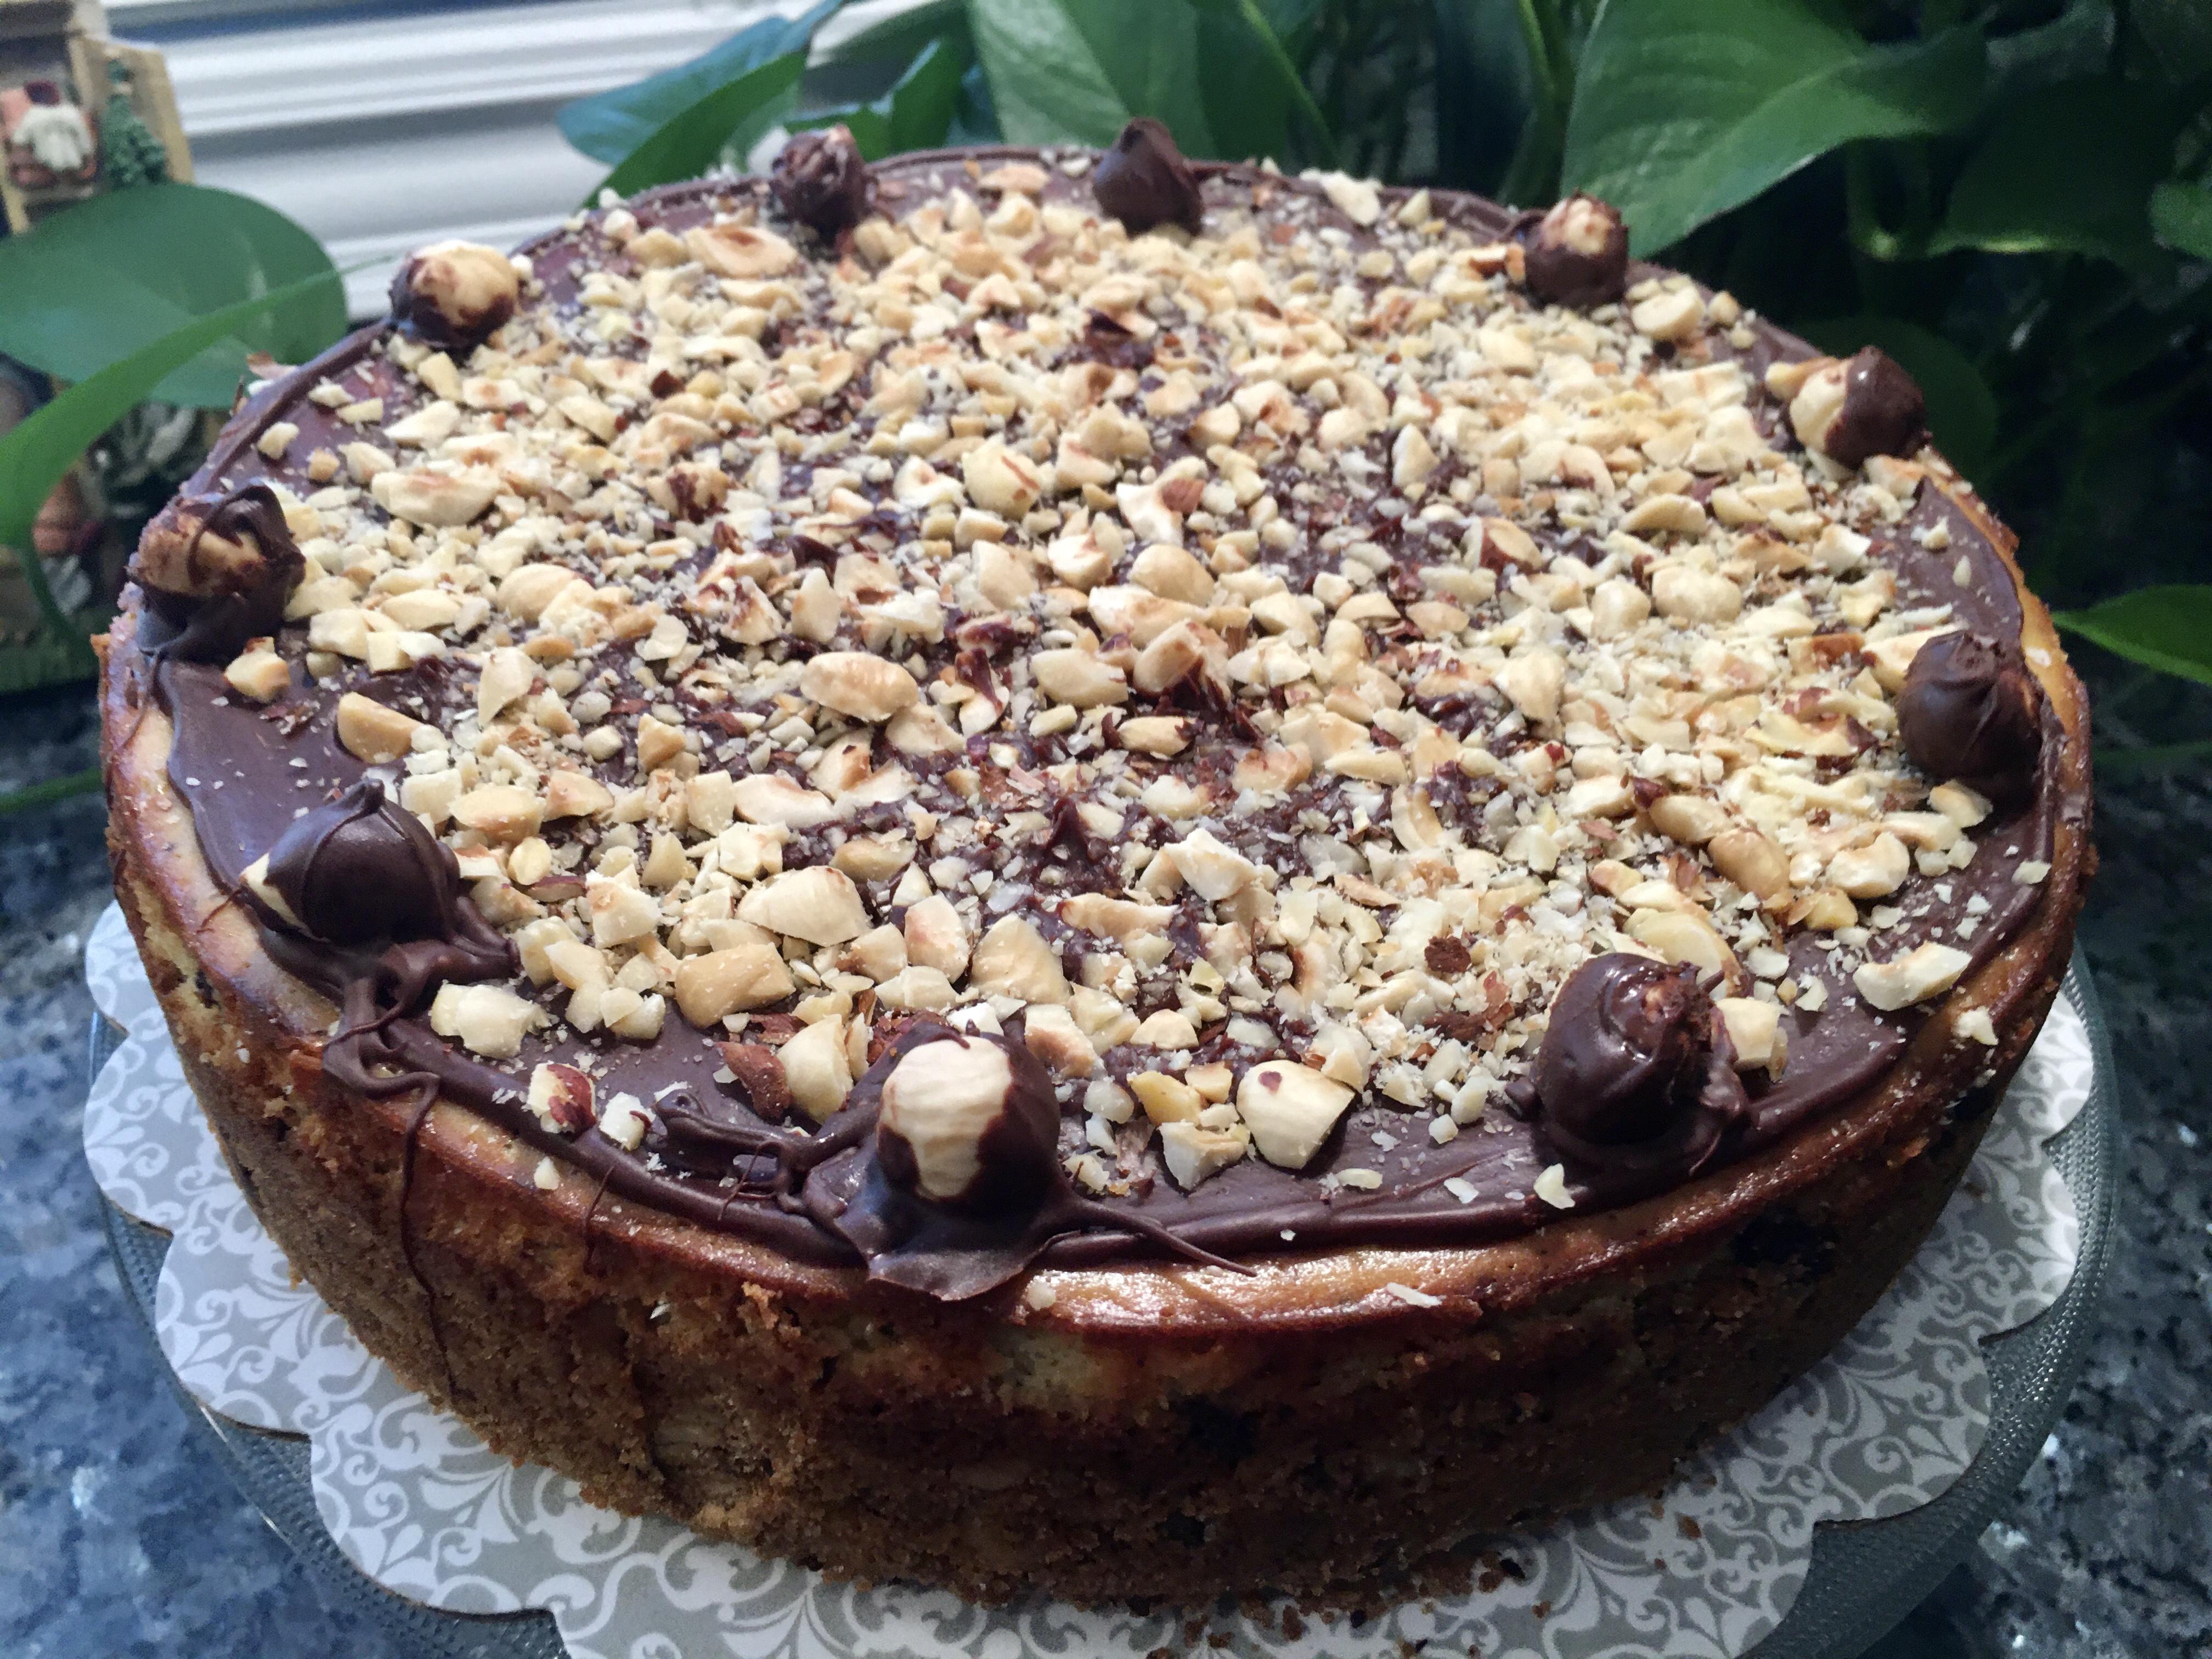 Heavenly Chipped Chocolate and Hazelnut Cheesecake